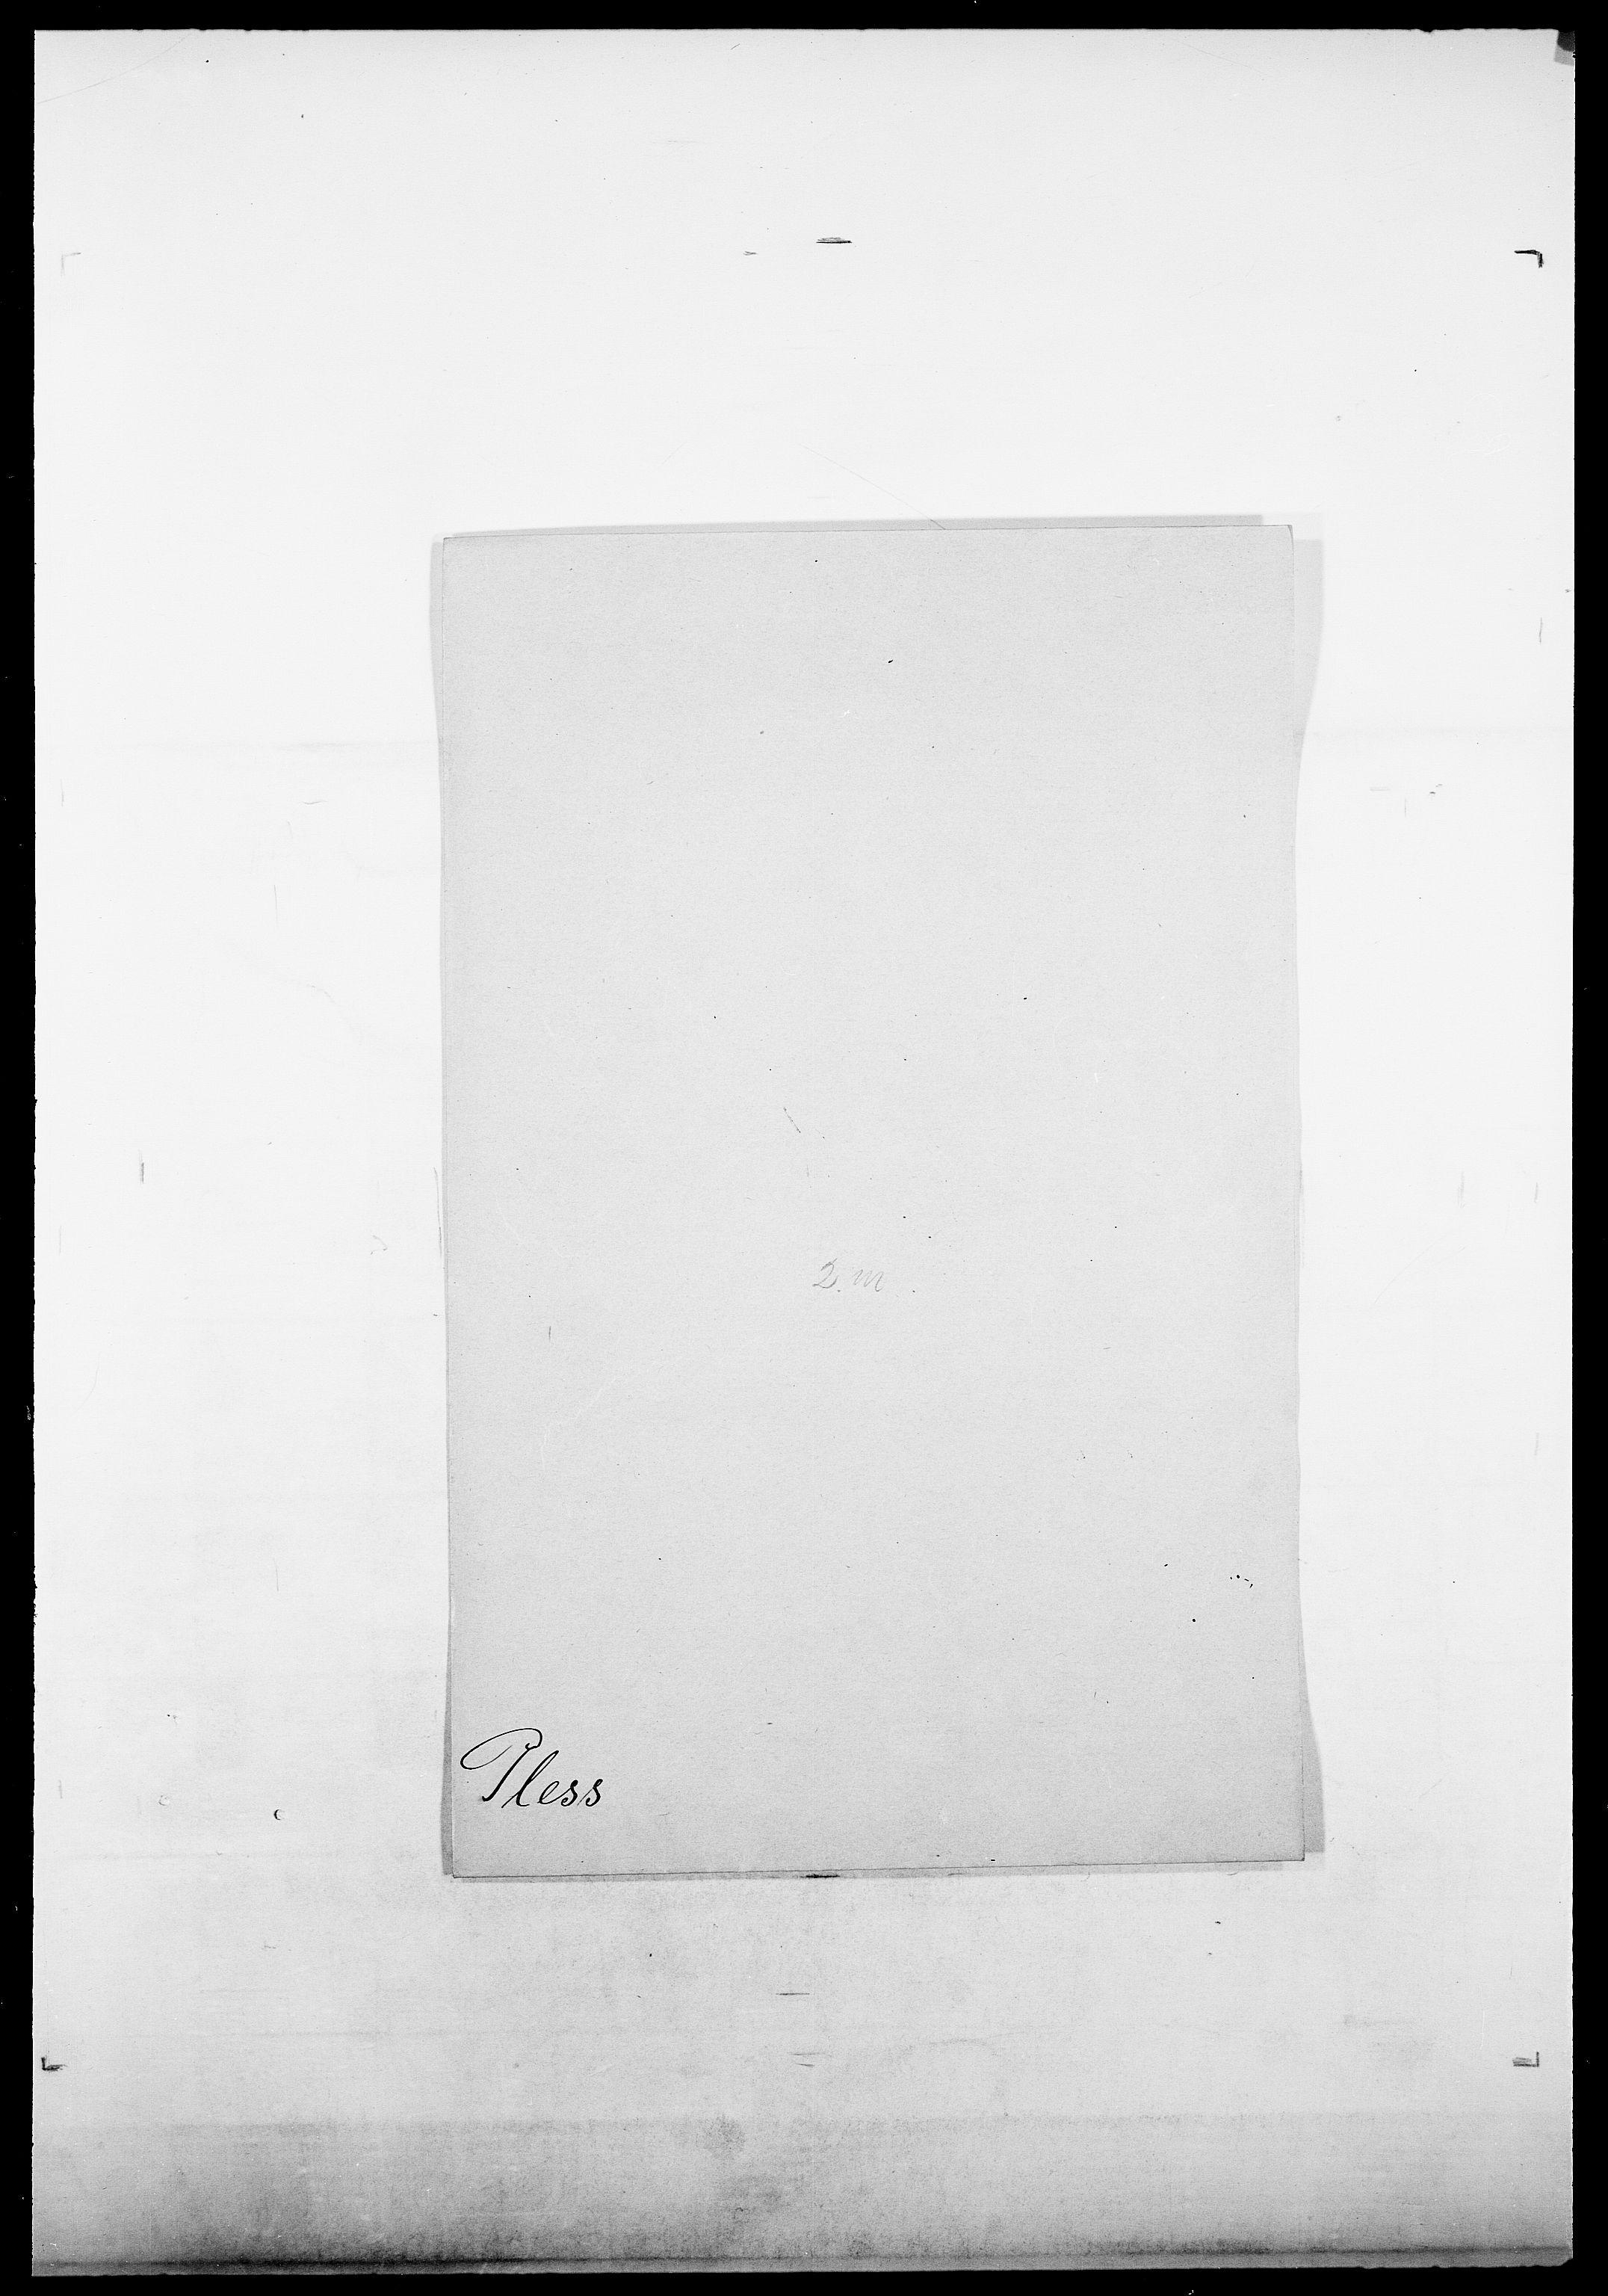 SAO, Delgobe, Charles Antoine - samling, D/Da/L0031: de Place - Raaum, s. 120